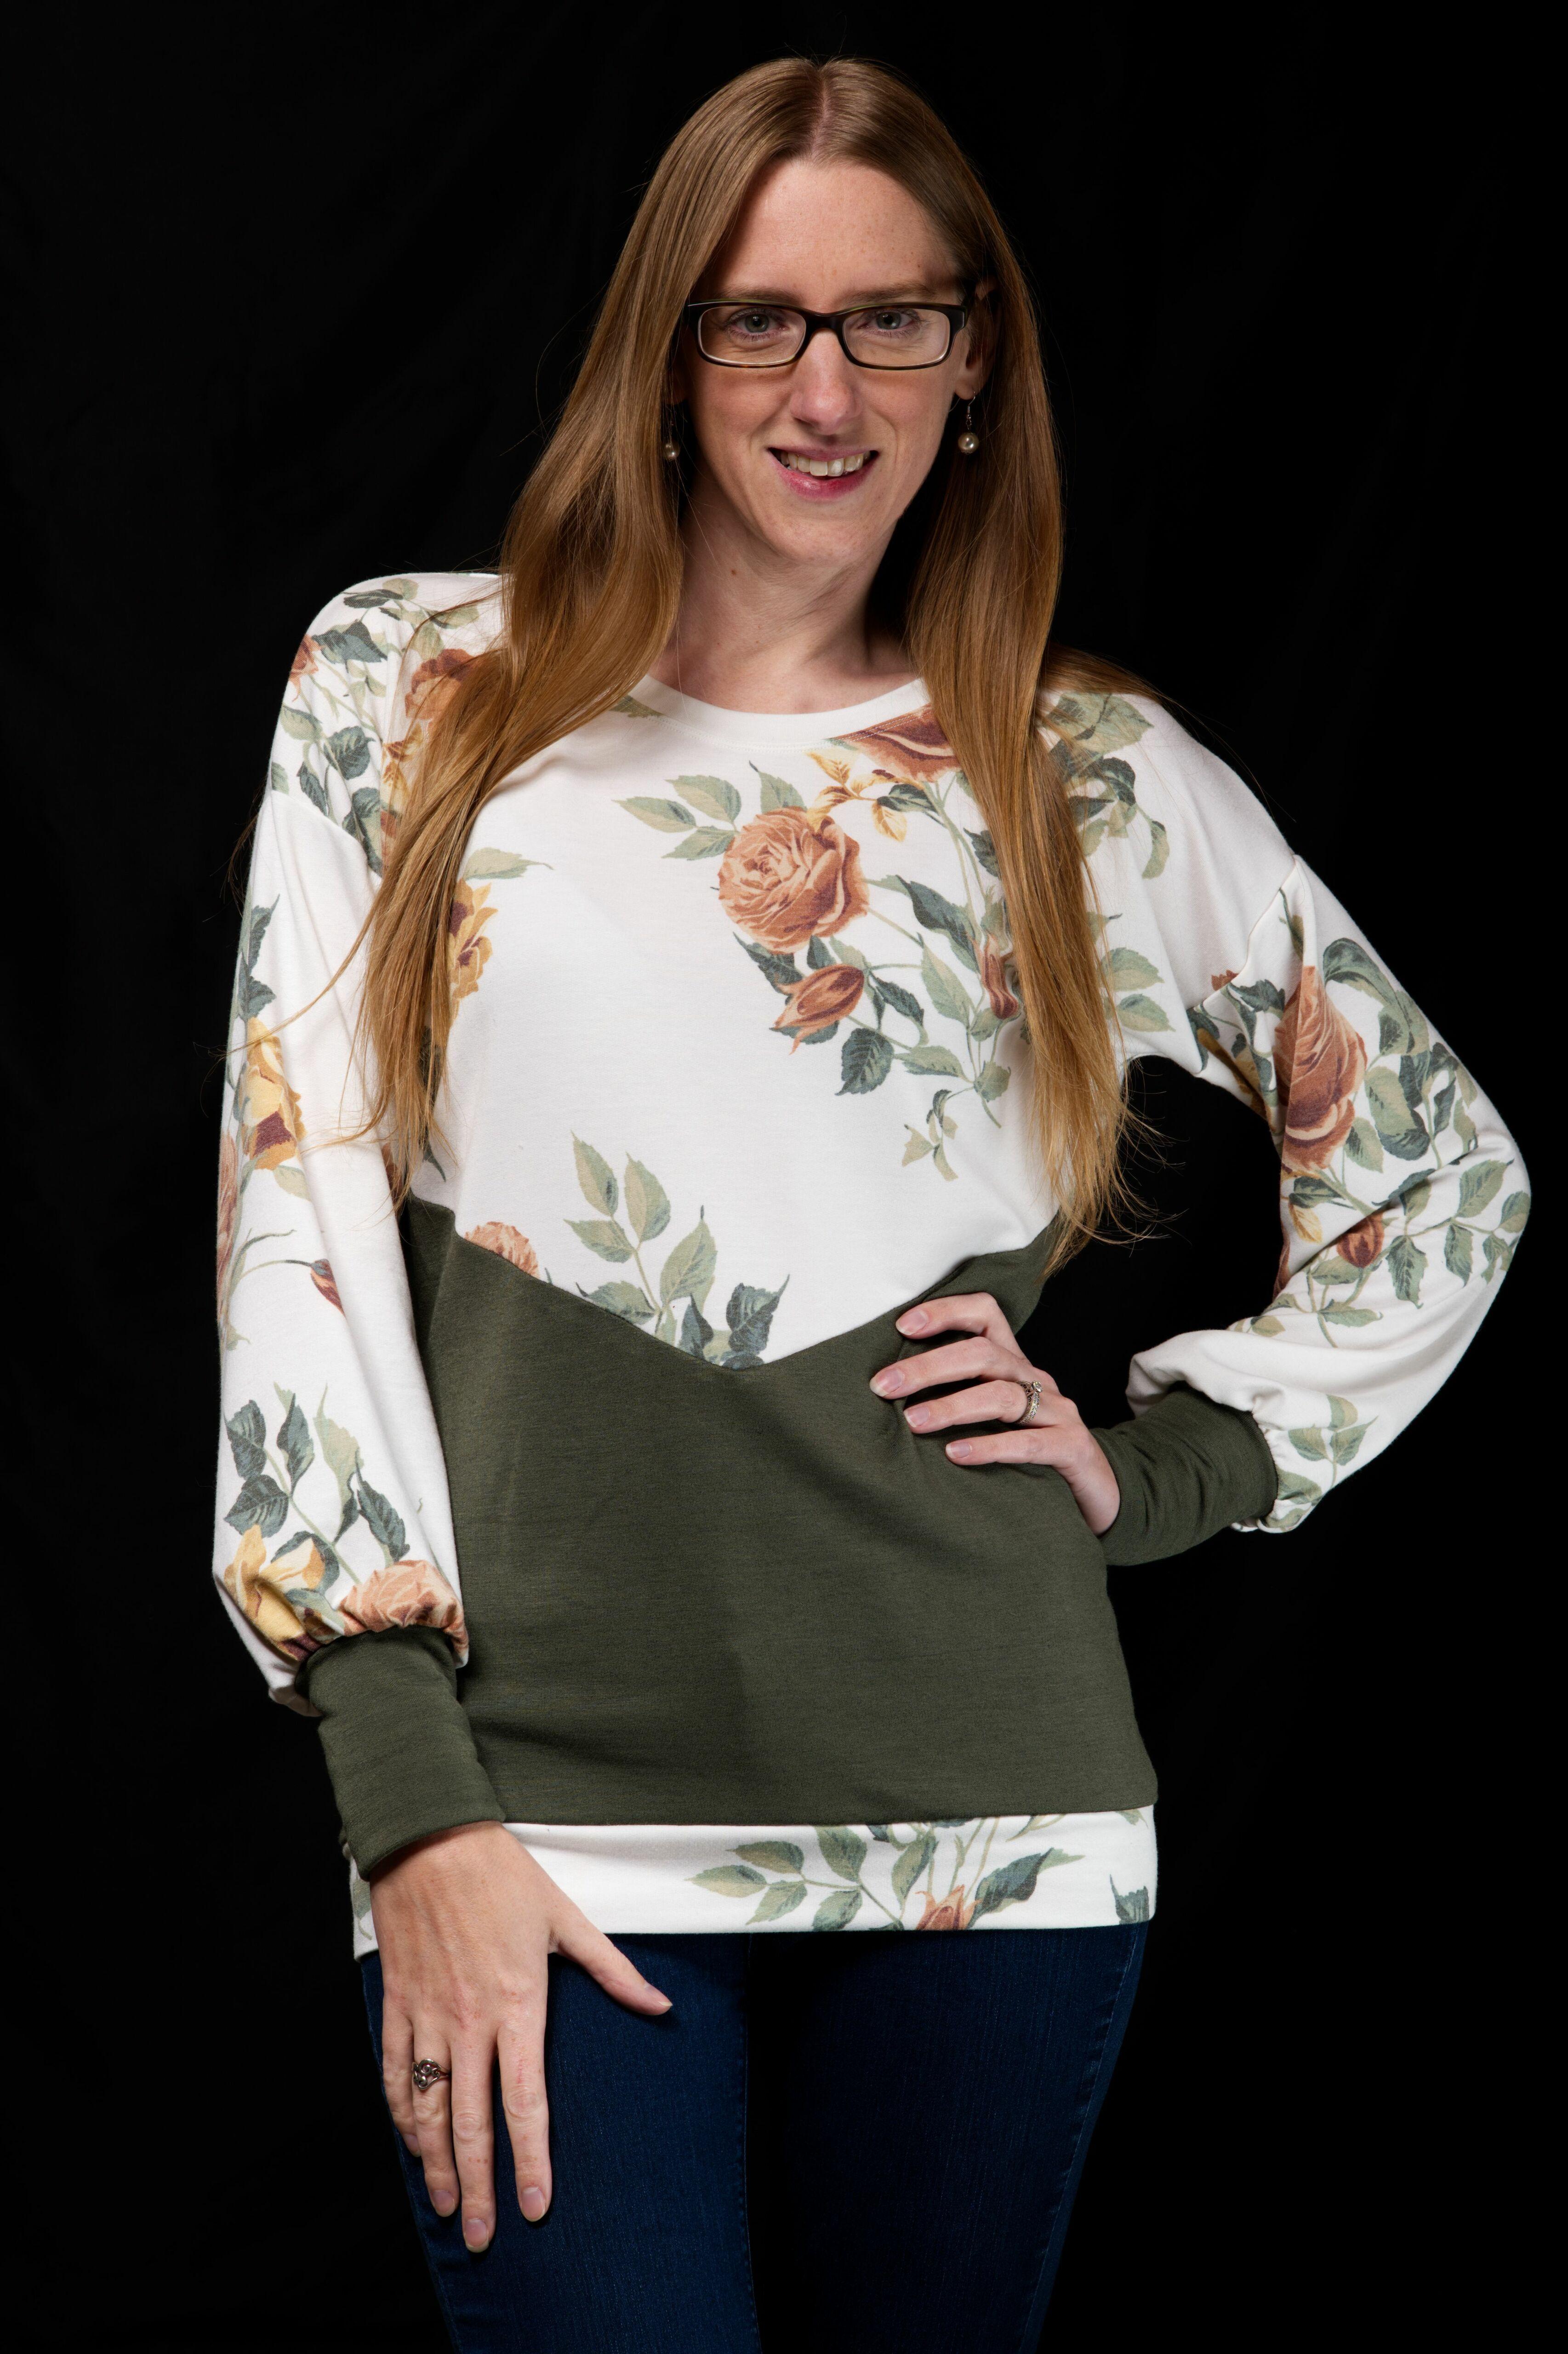 Valley's Top, Tunic Dress, Midi and Maxi Sizes XXS to 4X Adults PDF Pattern